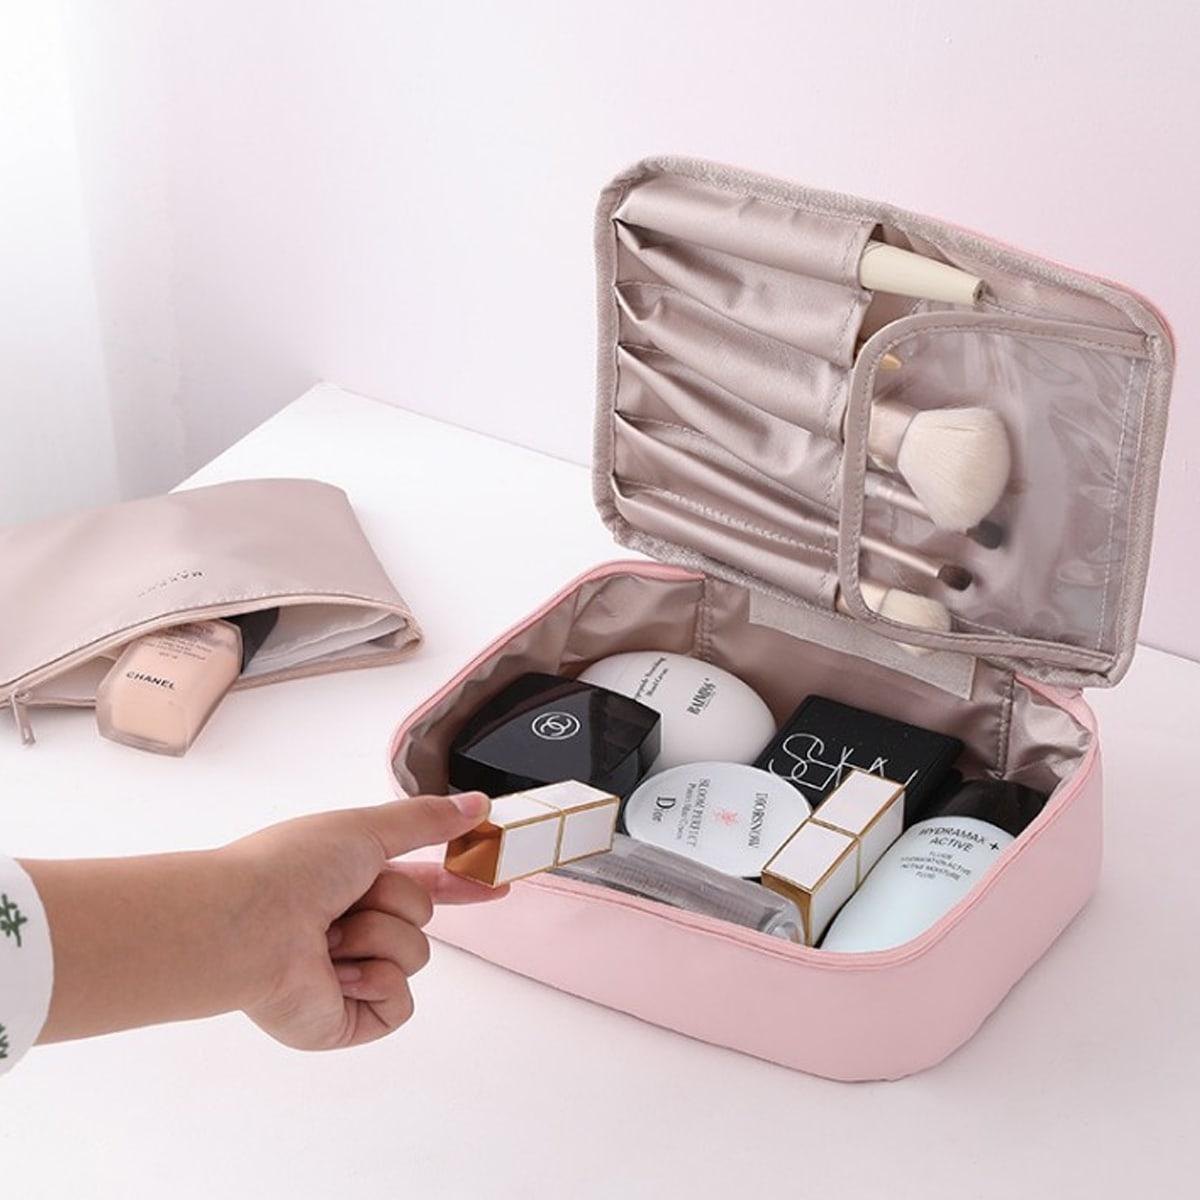 1pc draagbare draagbare cosmetische opbergtas